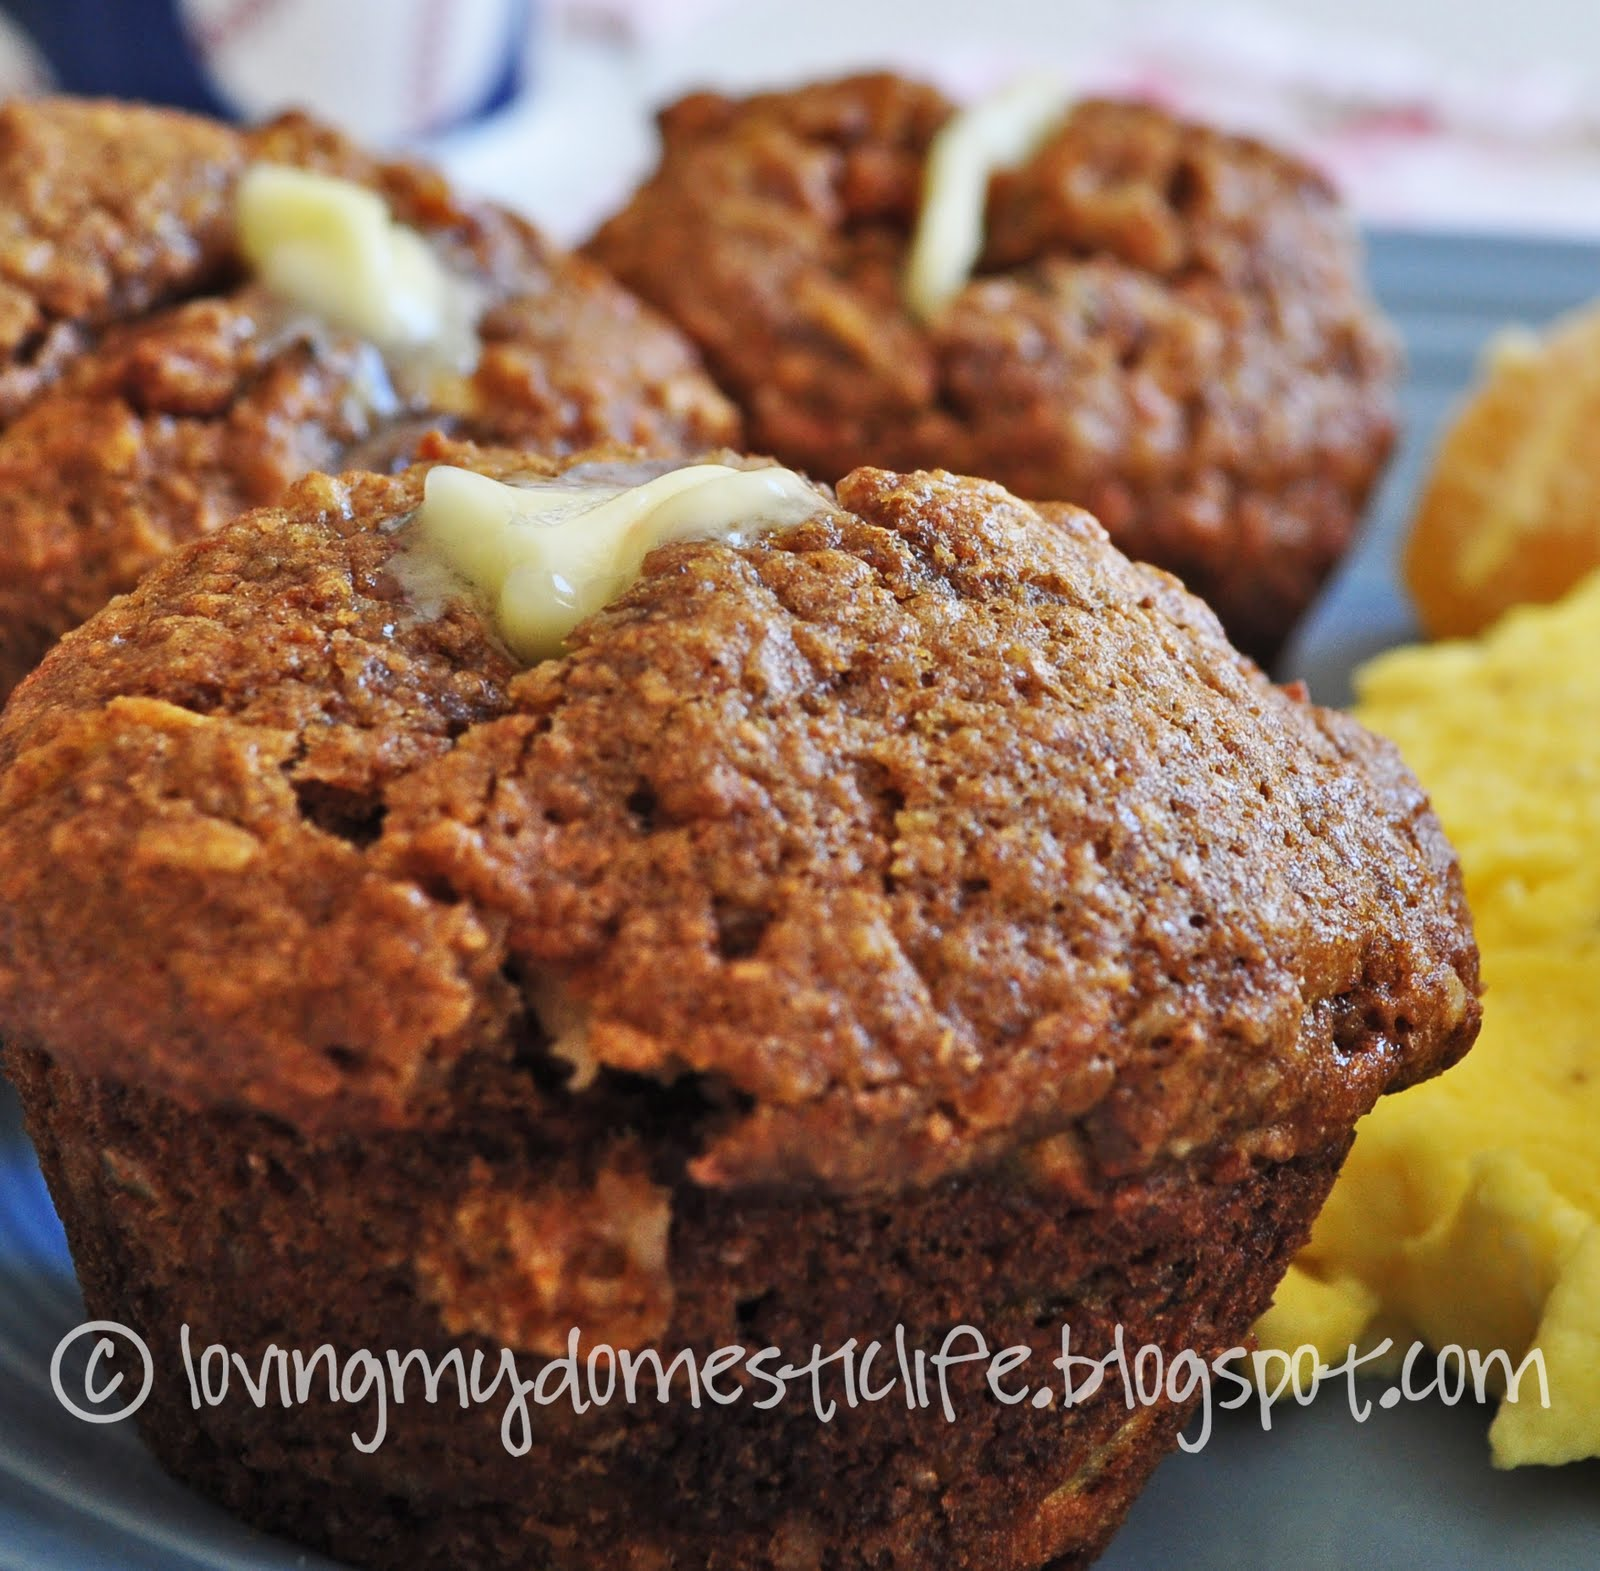 Loving My Domestic Life: Morning Glory Muffins